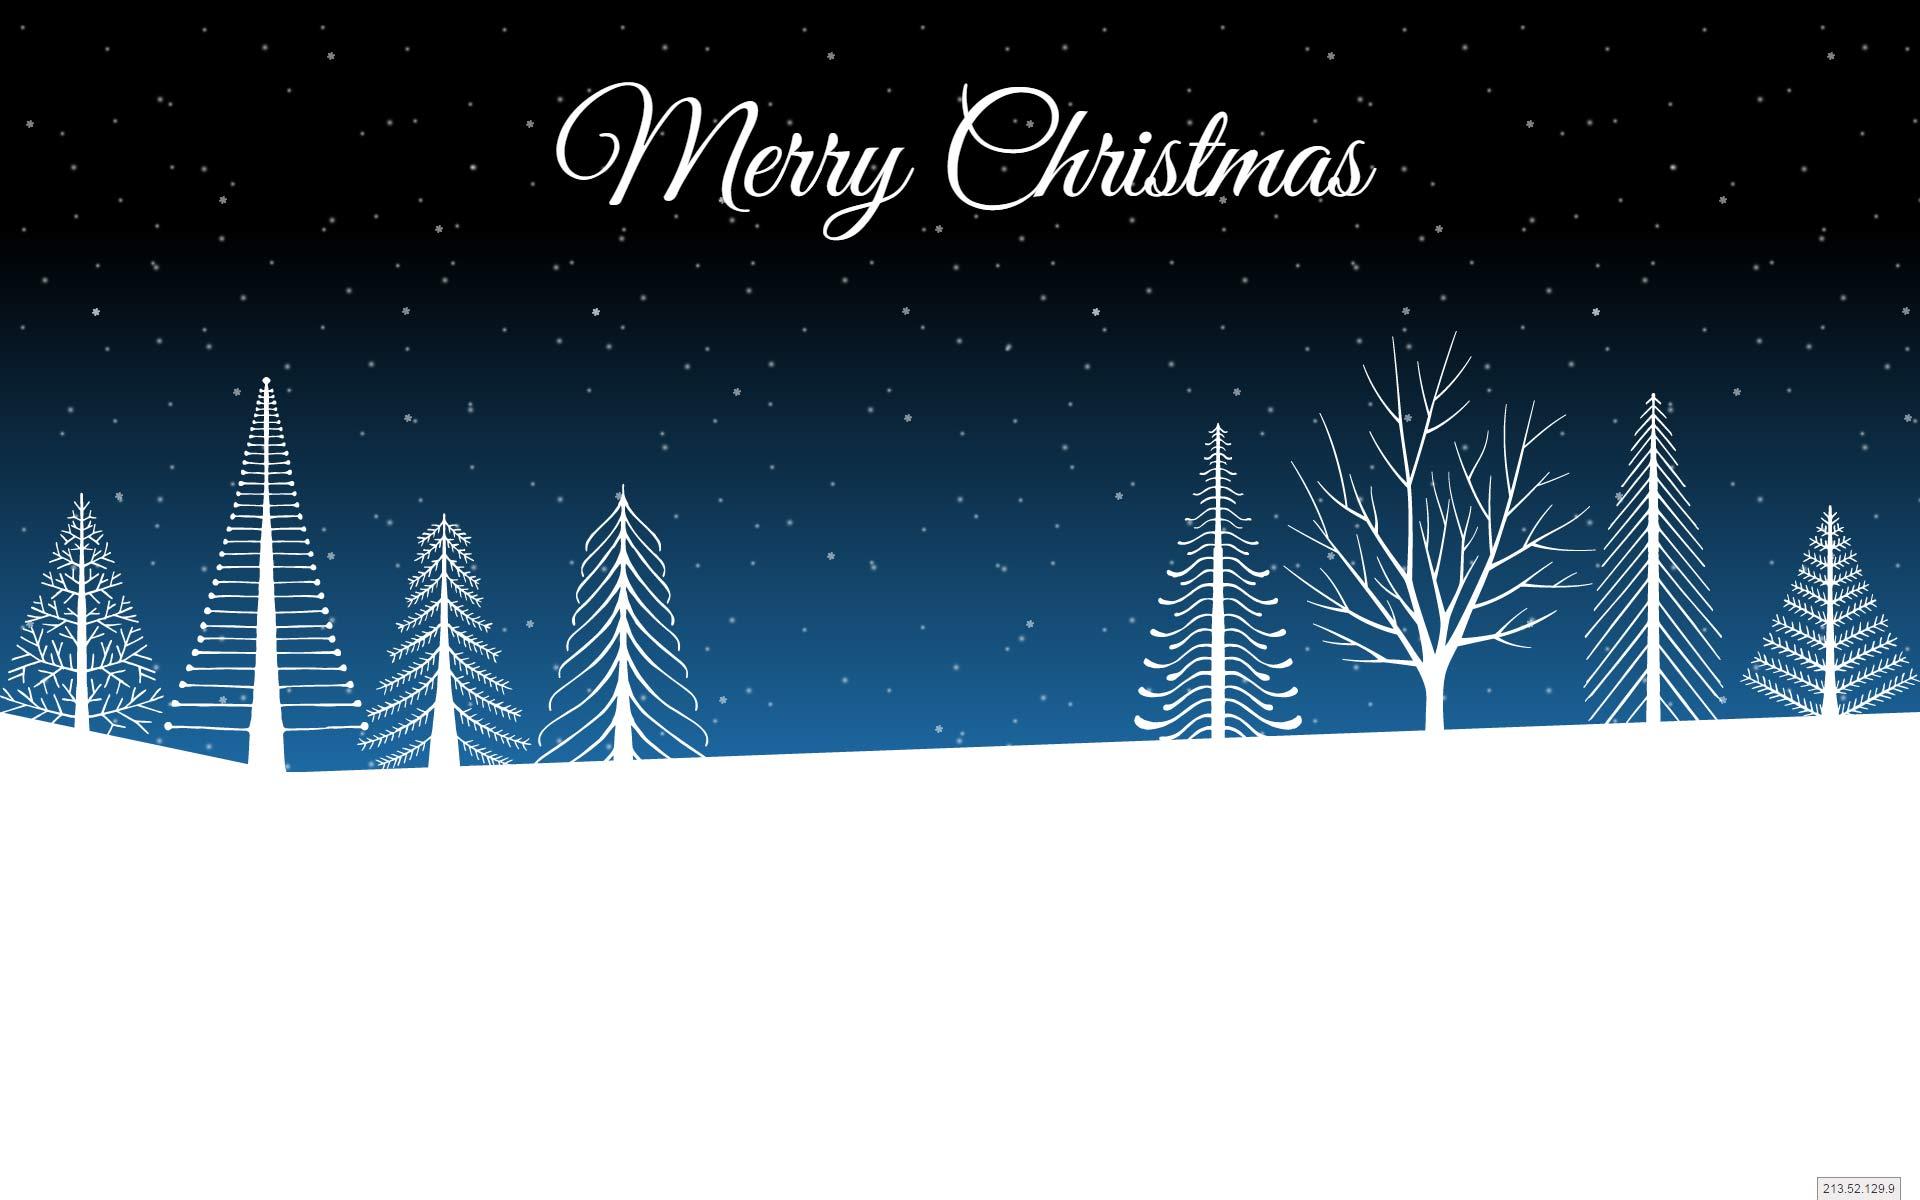 WJ-christmas-back-edm.jpg